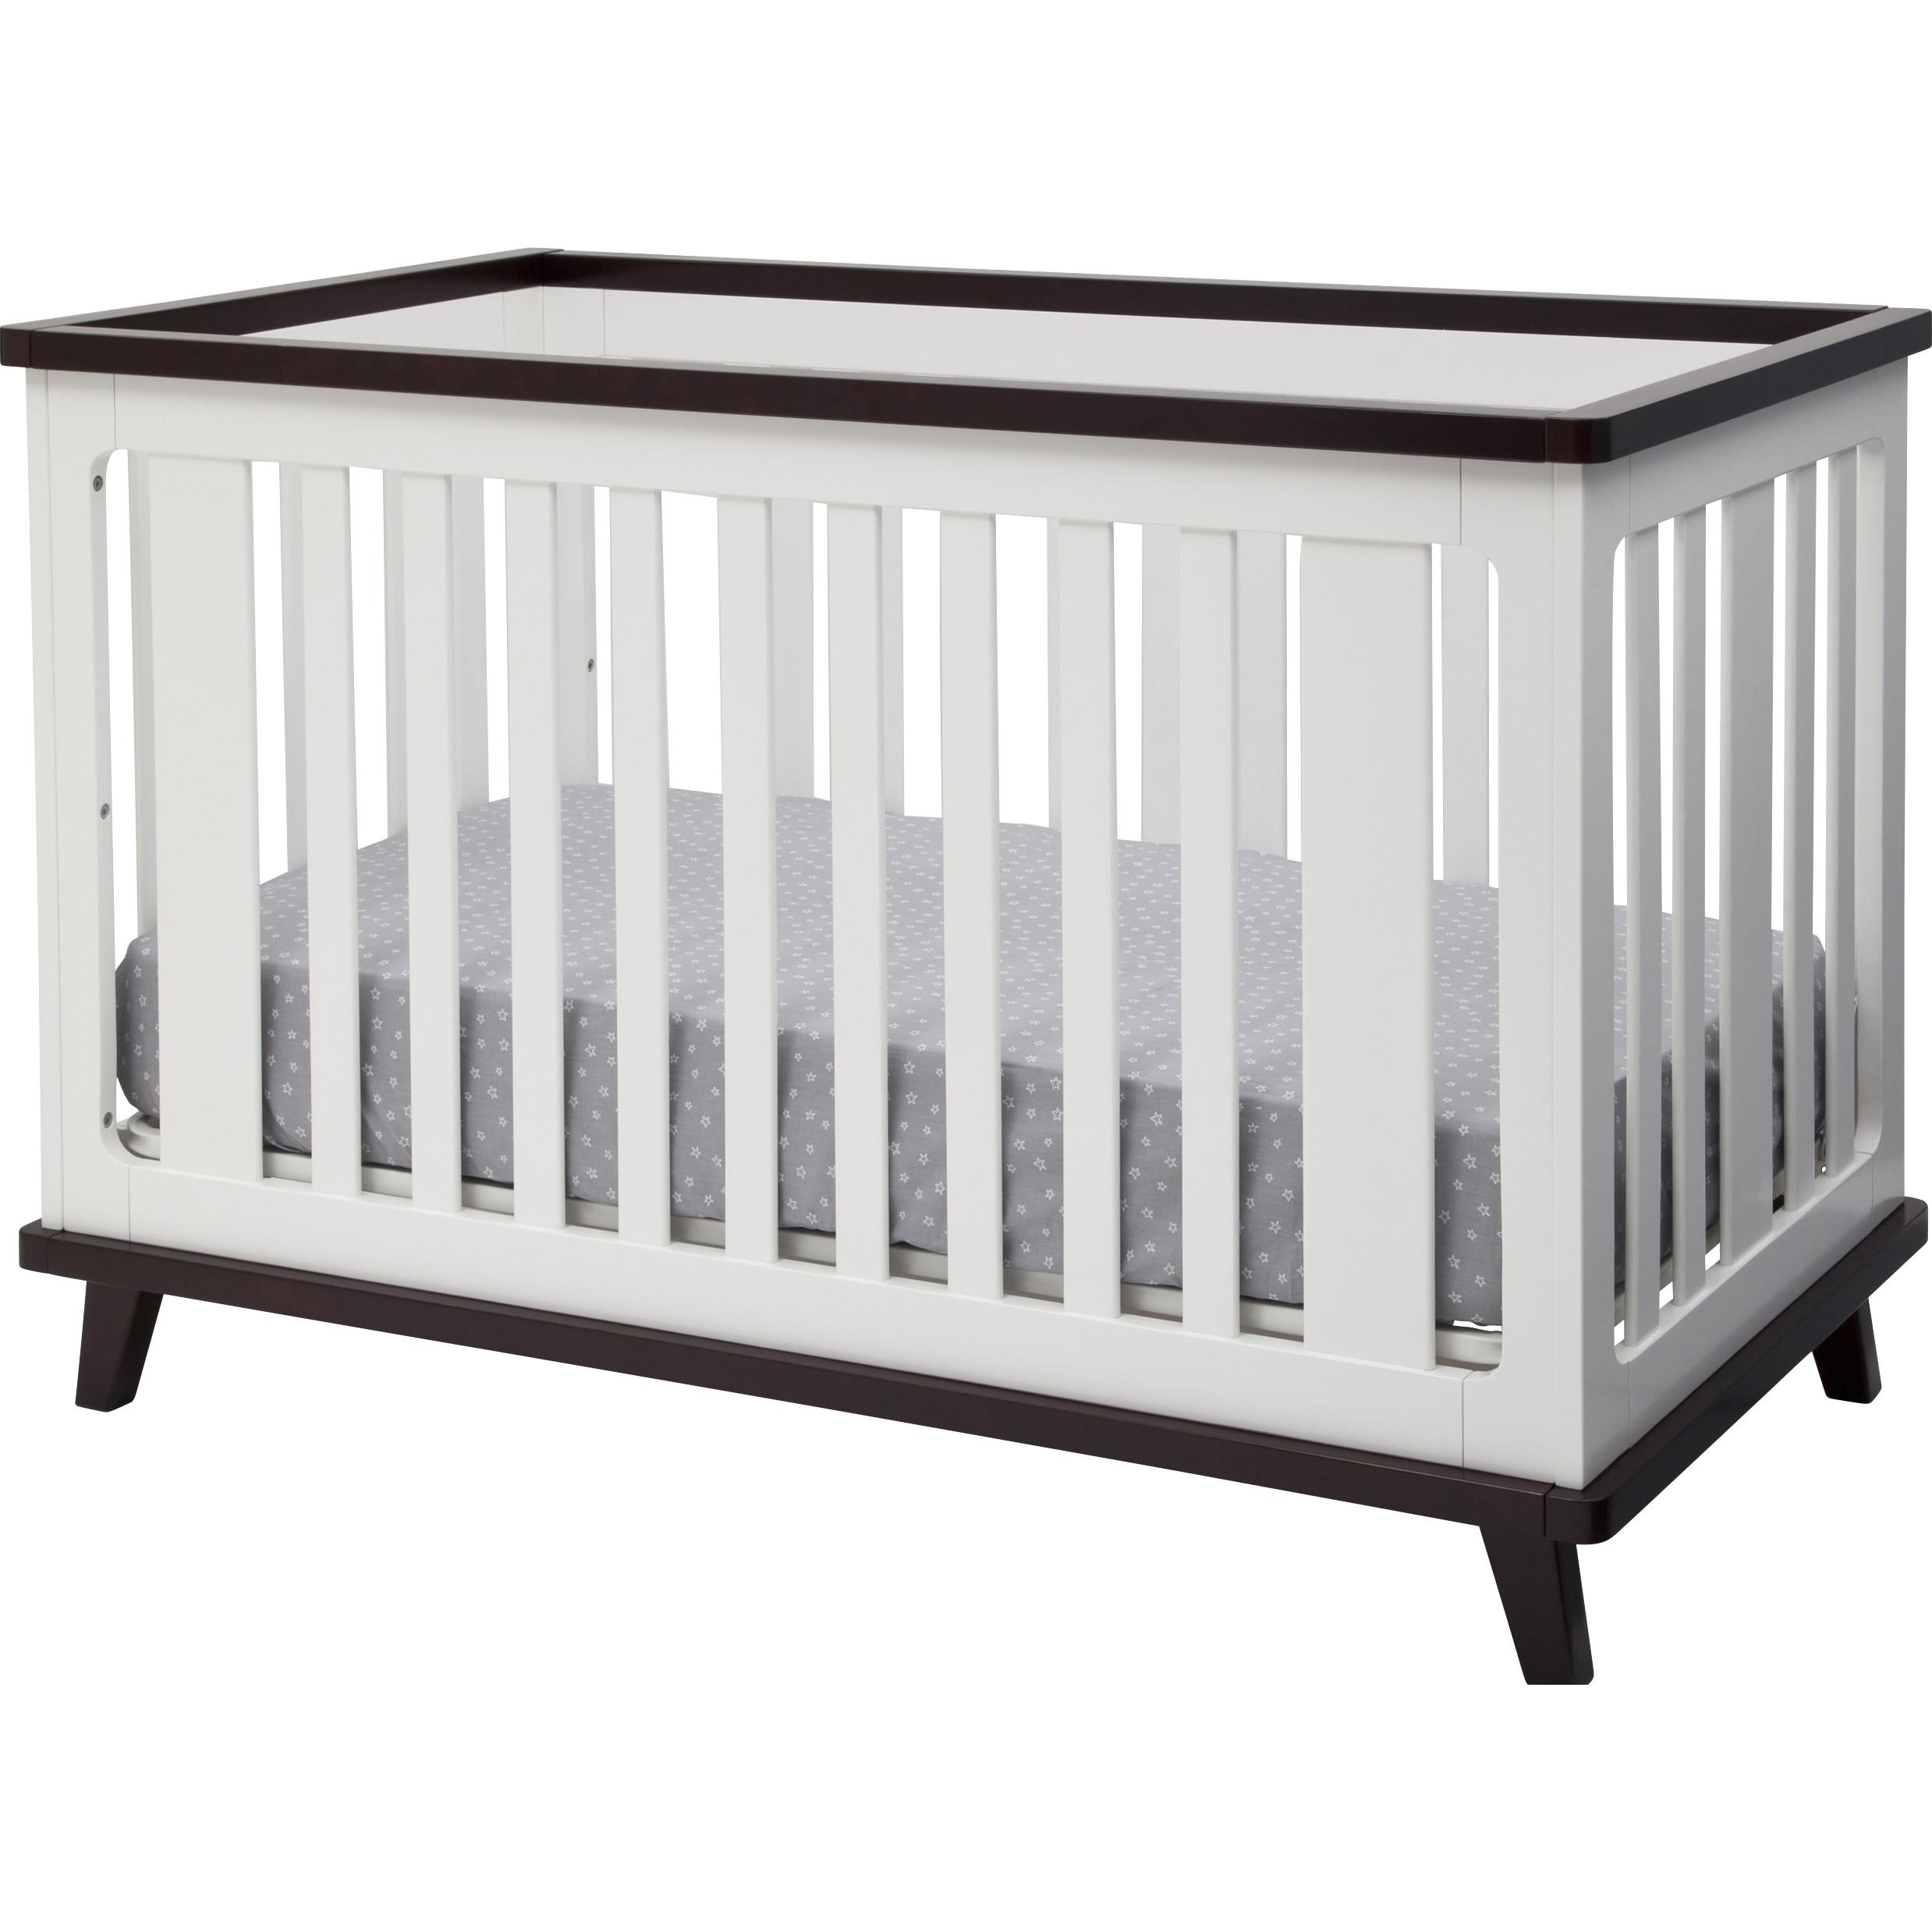 Delta Children Ava 3-in-1 Crib - $249.00